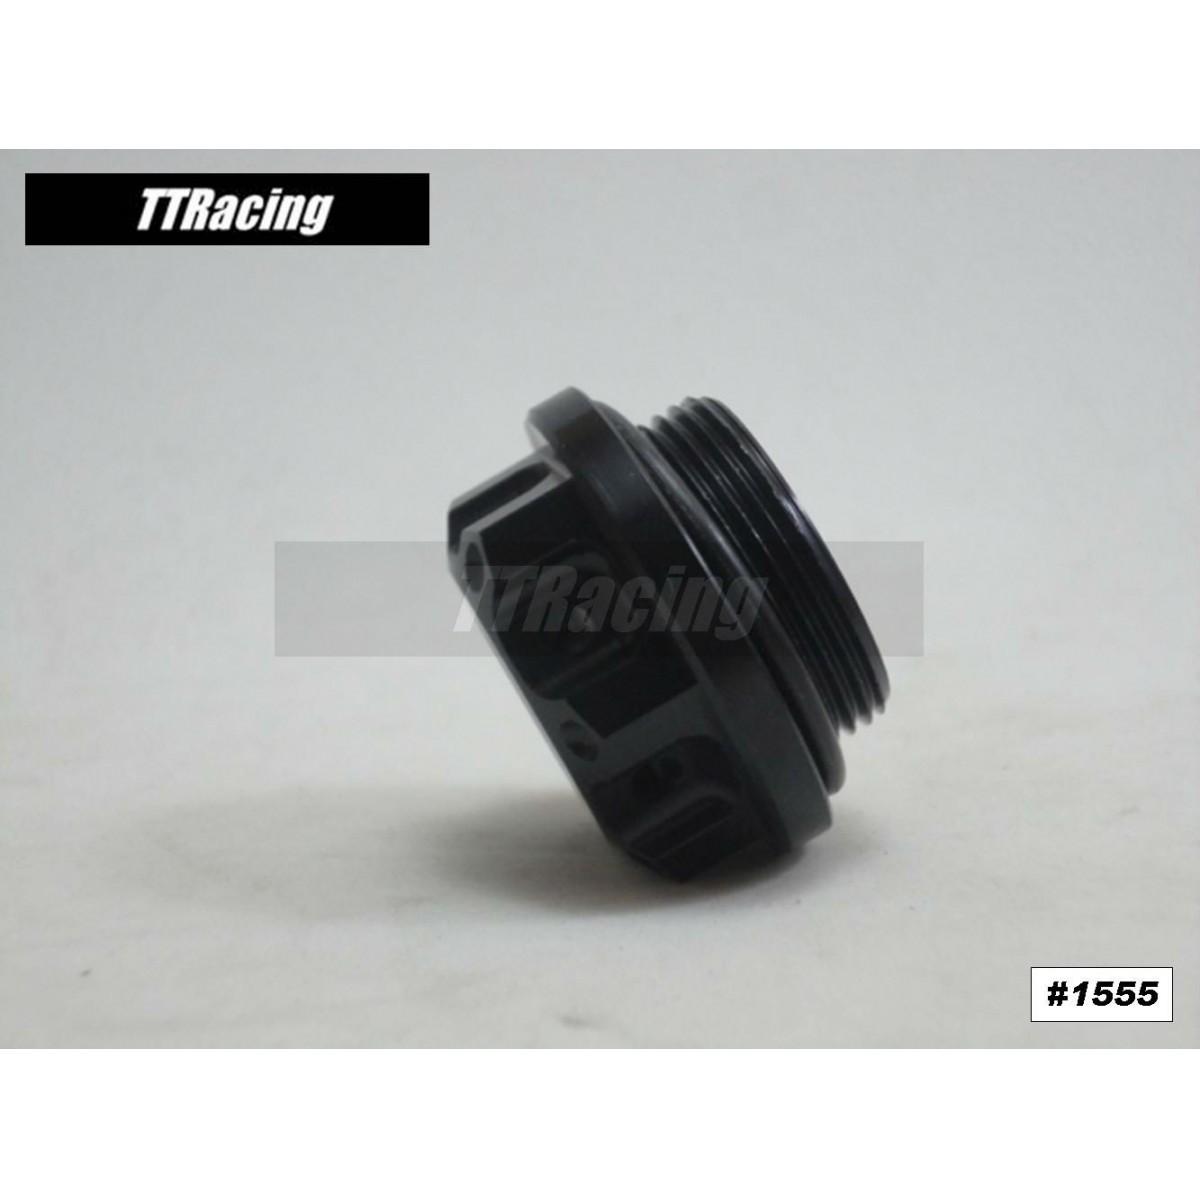 Tampa do óleo Yamaha XJ6 MT-01 R1 PRETO  - T & T Soluções